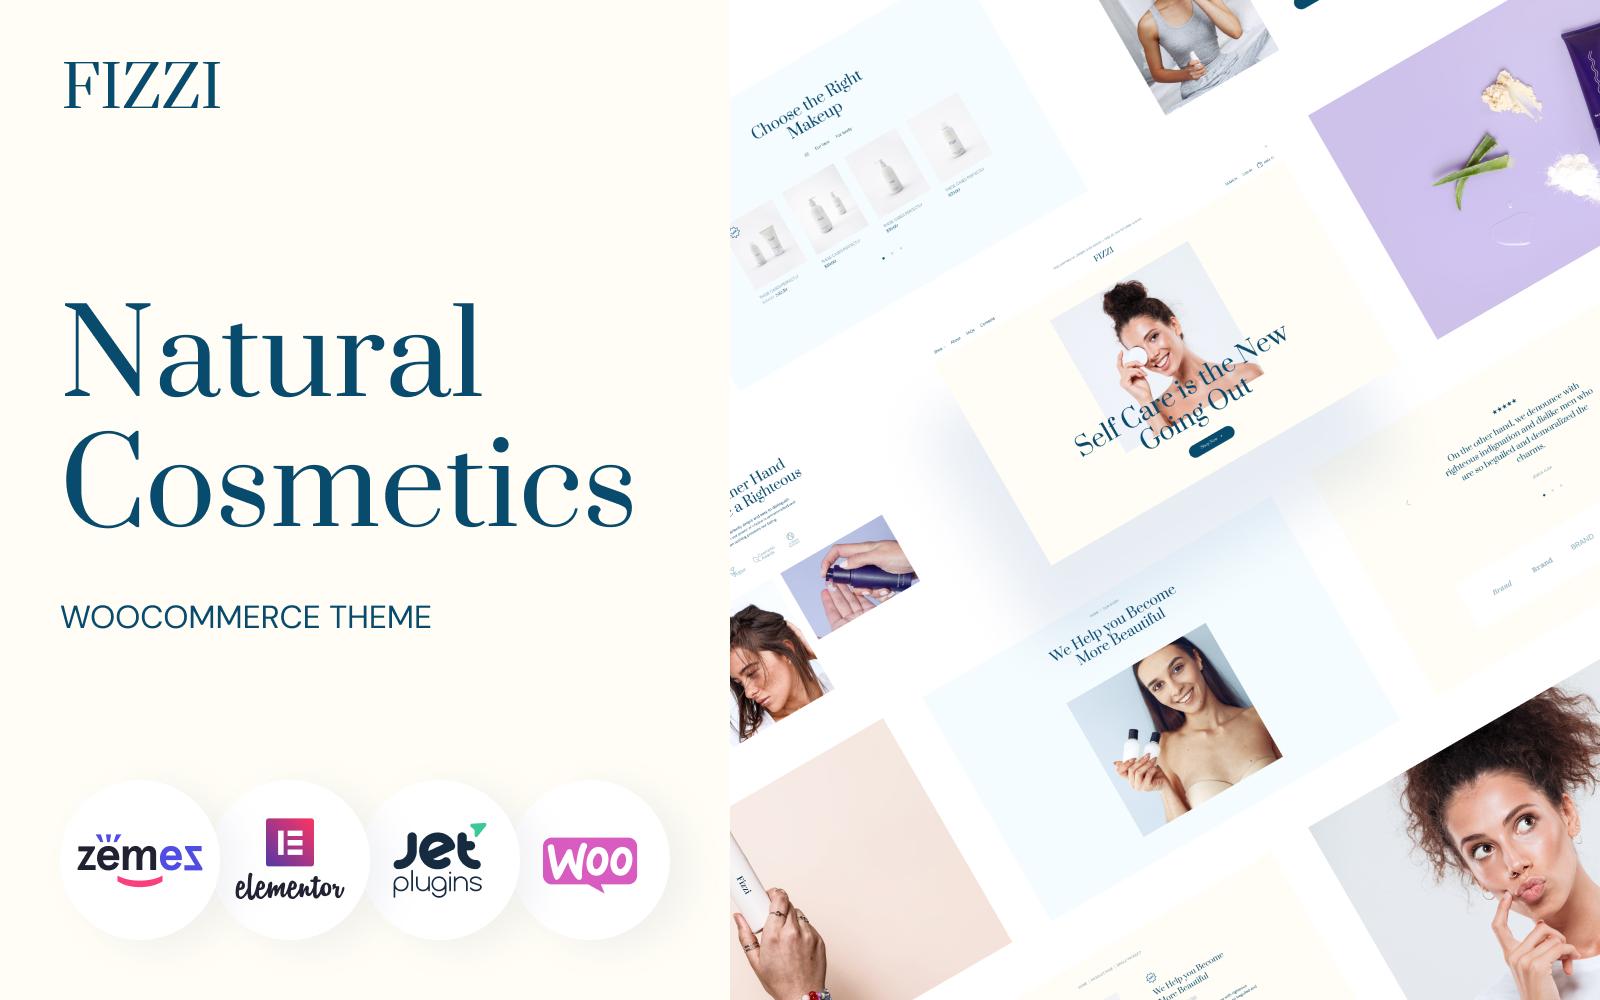 Reszponzív Natural Cosmetics Website Template - Fizzi WooCommerce sablon 139732